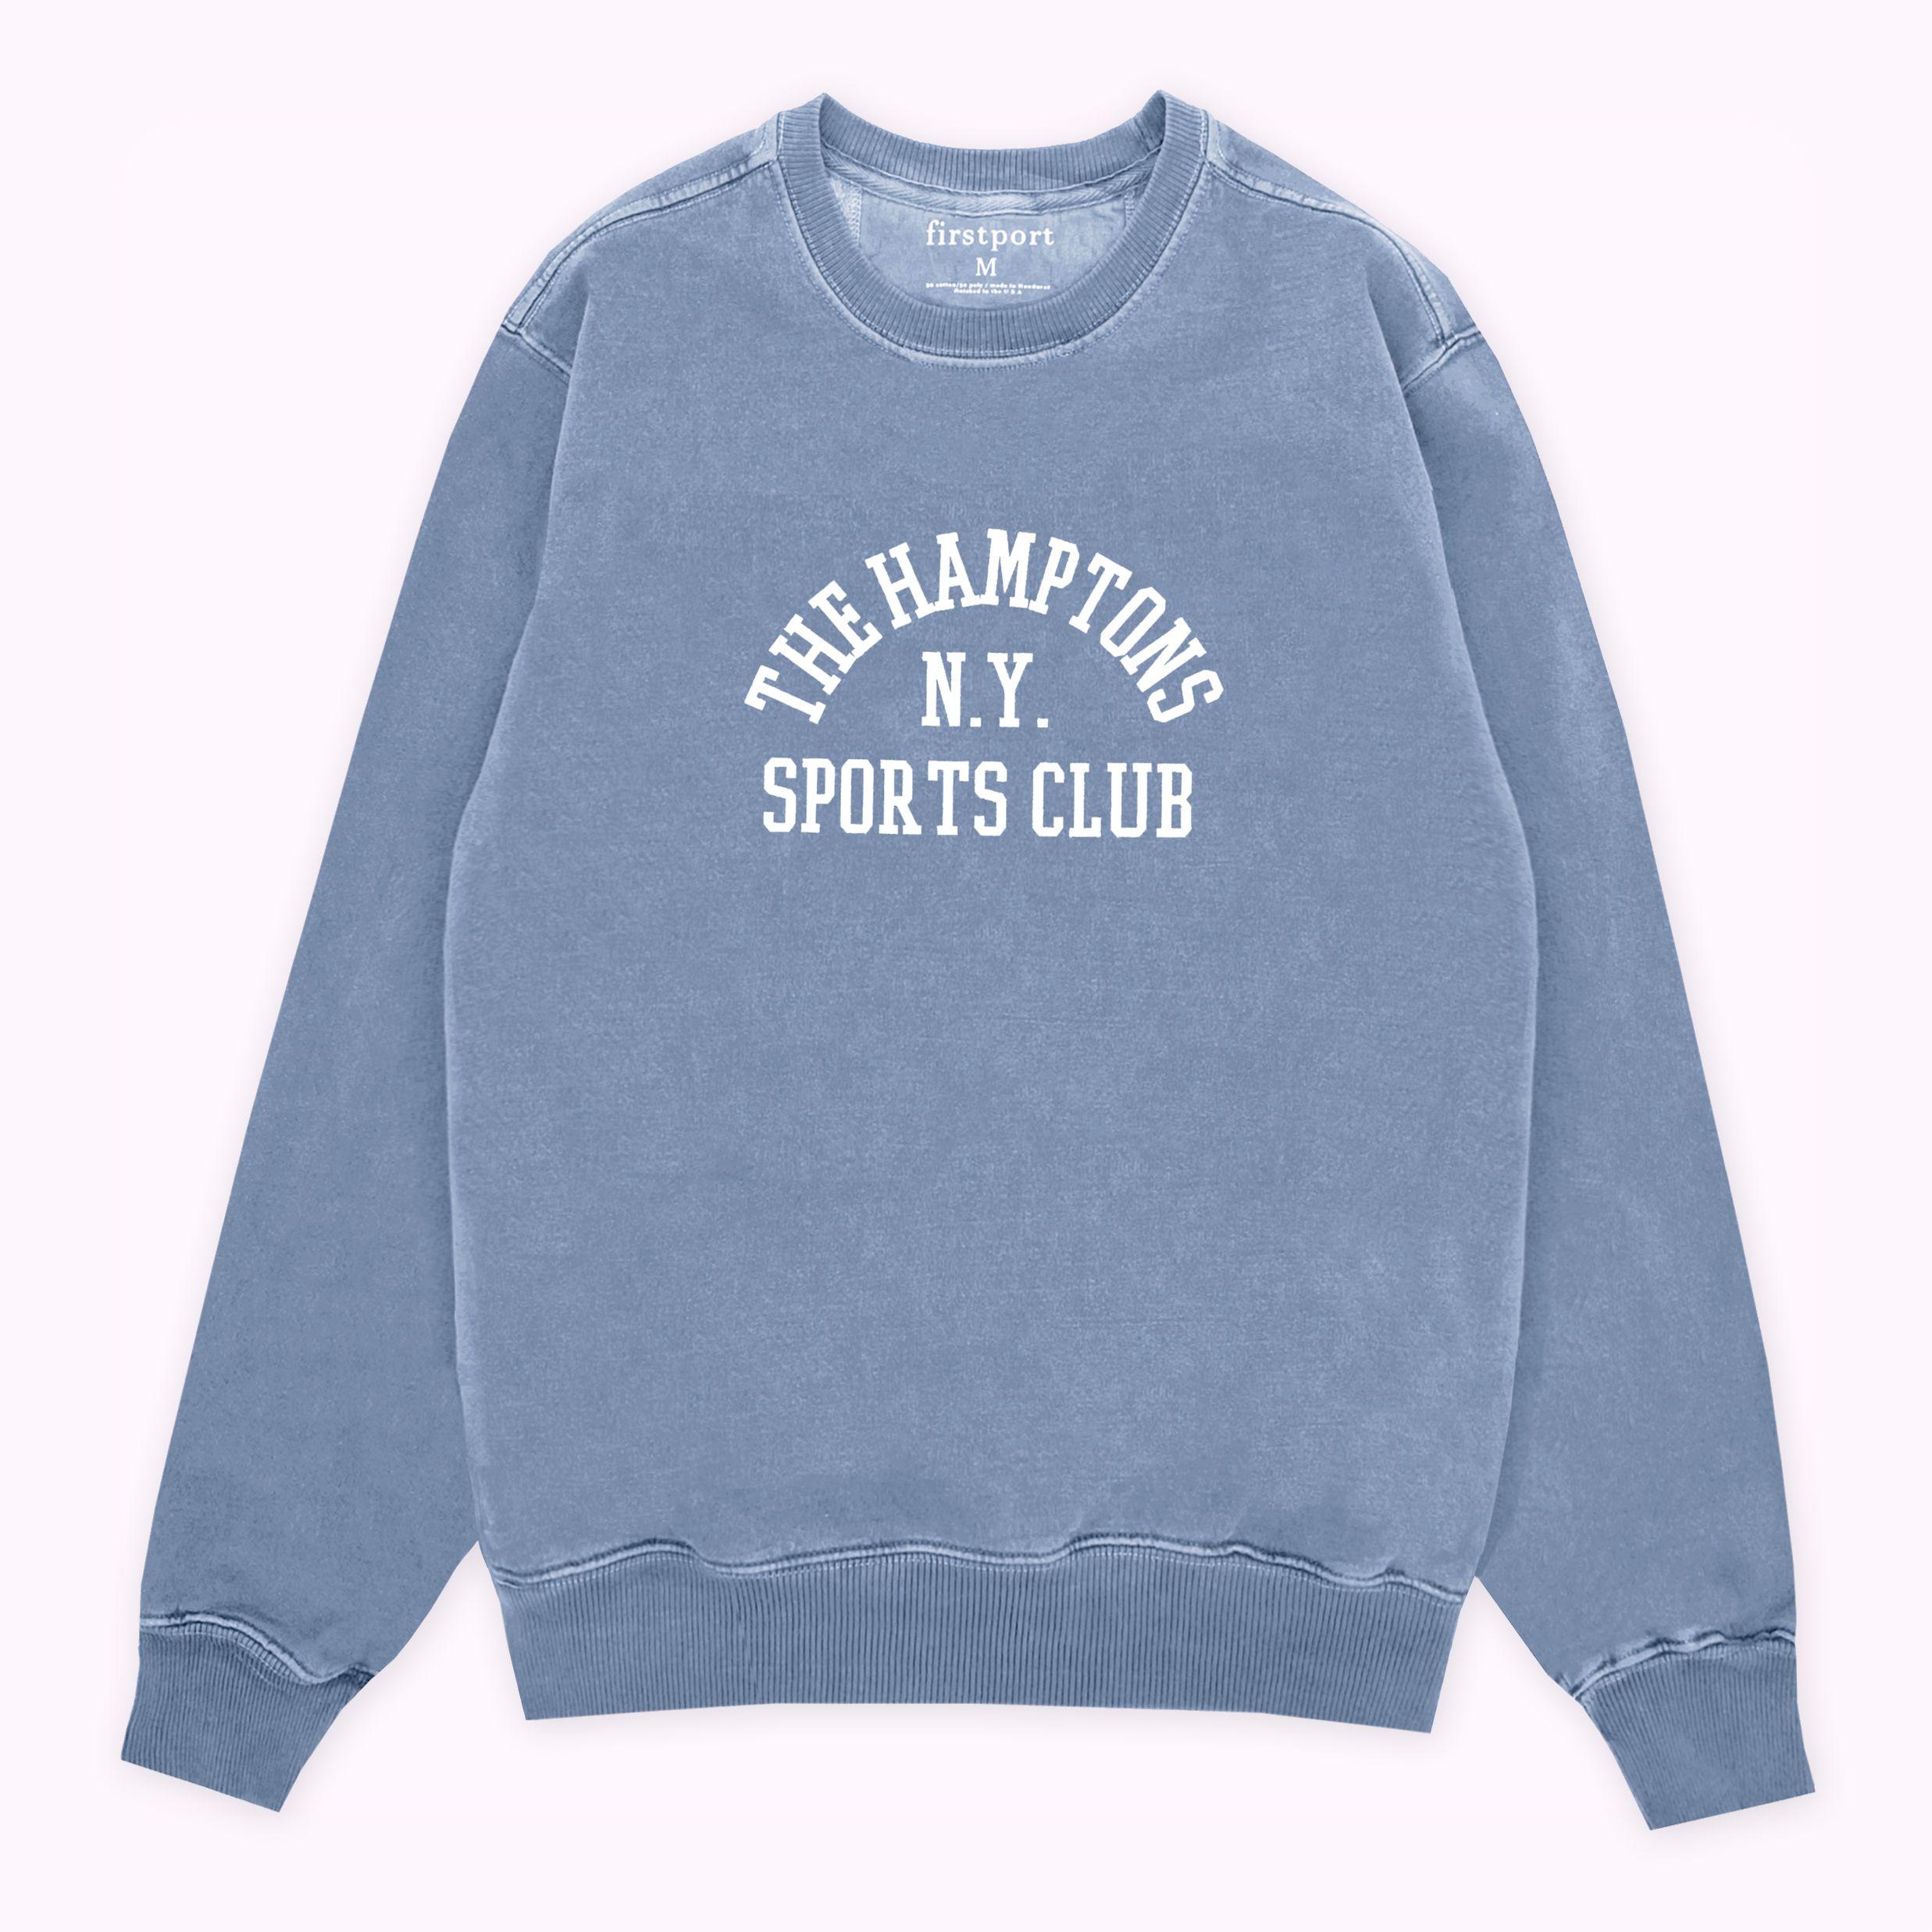 The Hamptons Sc Crewneck Washed Blue Vintage Crewneck Club Shirts Garment Dye [ 2474 x 2474 Pixel ]